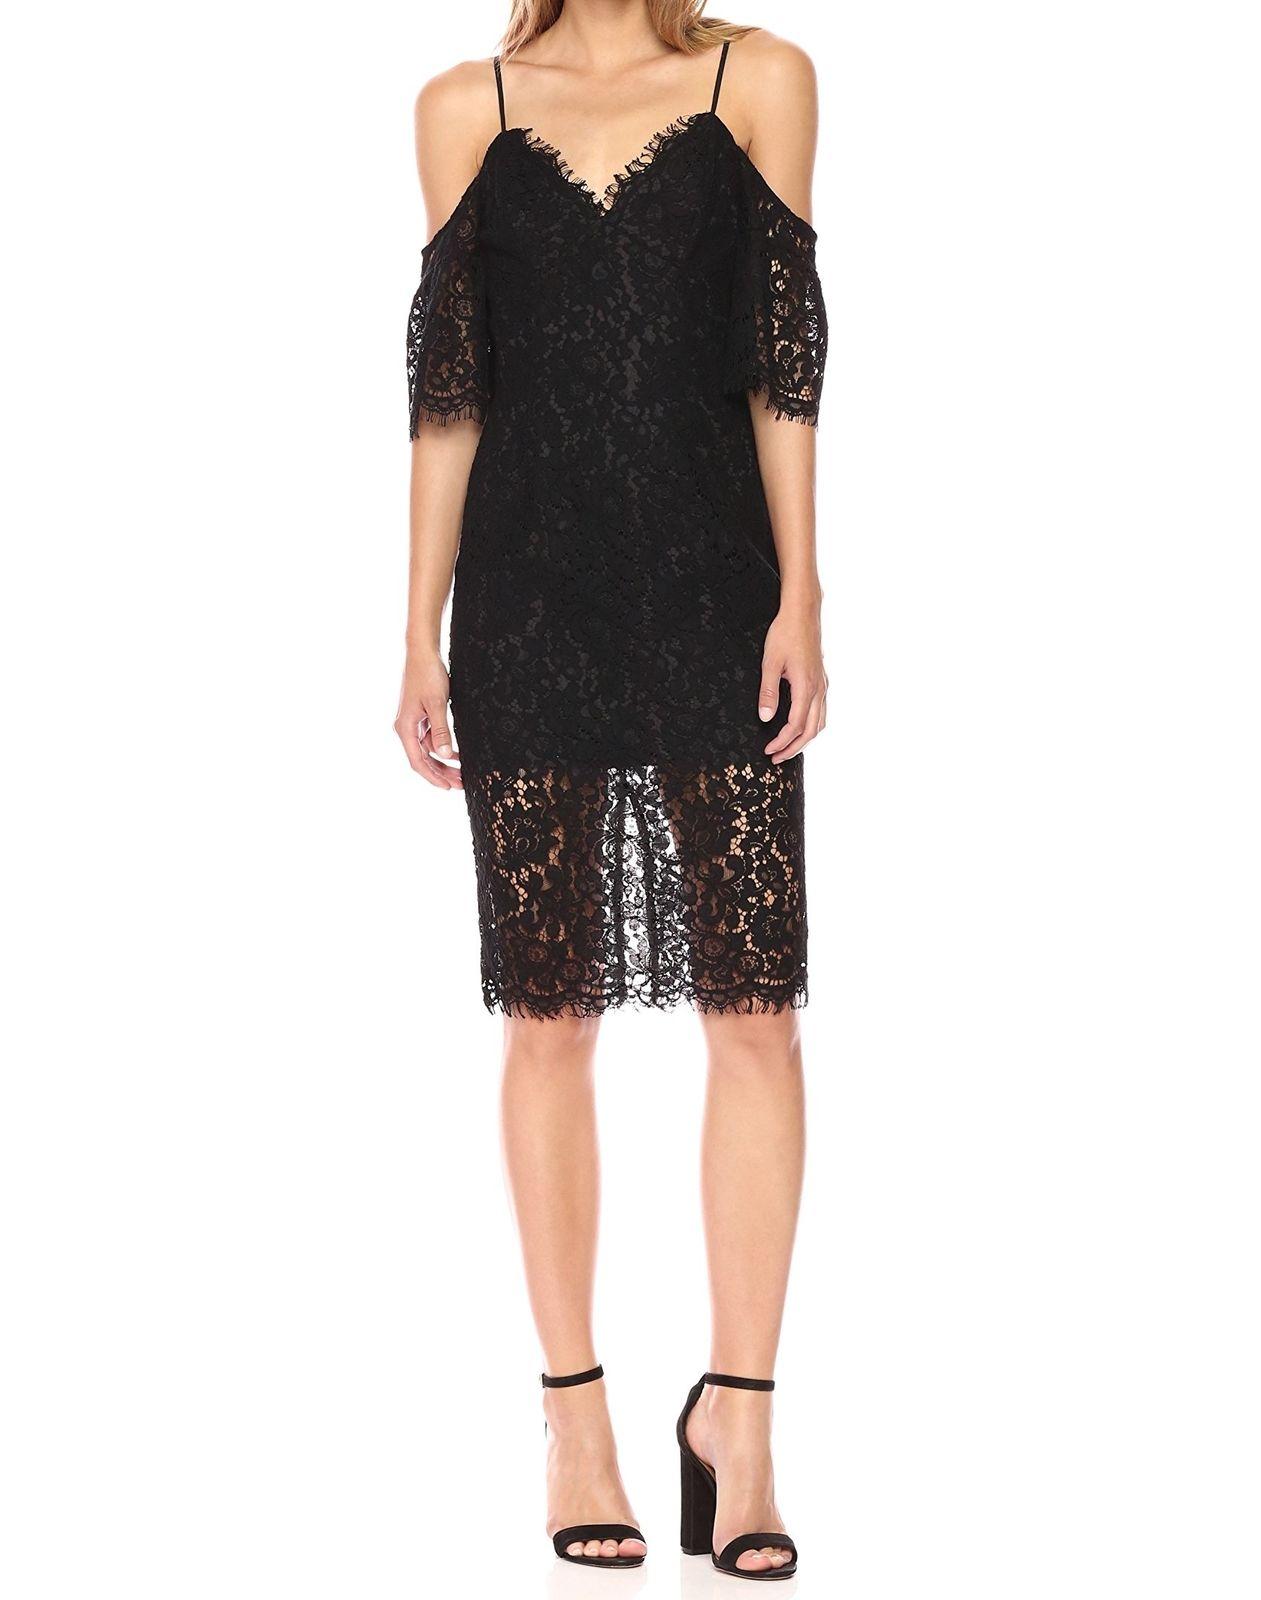 c2f8846c56b Bardot платье футляр кружевное черное - Friendly Brands